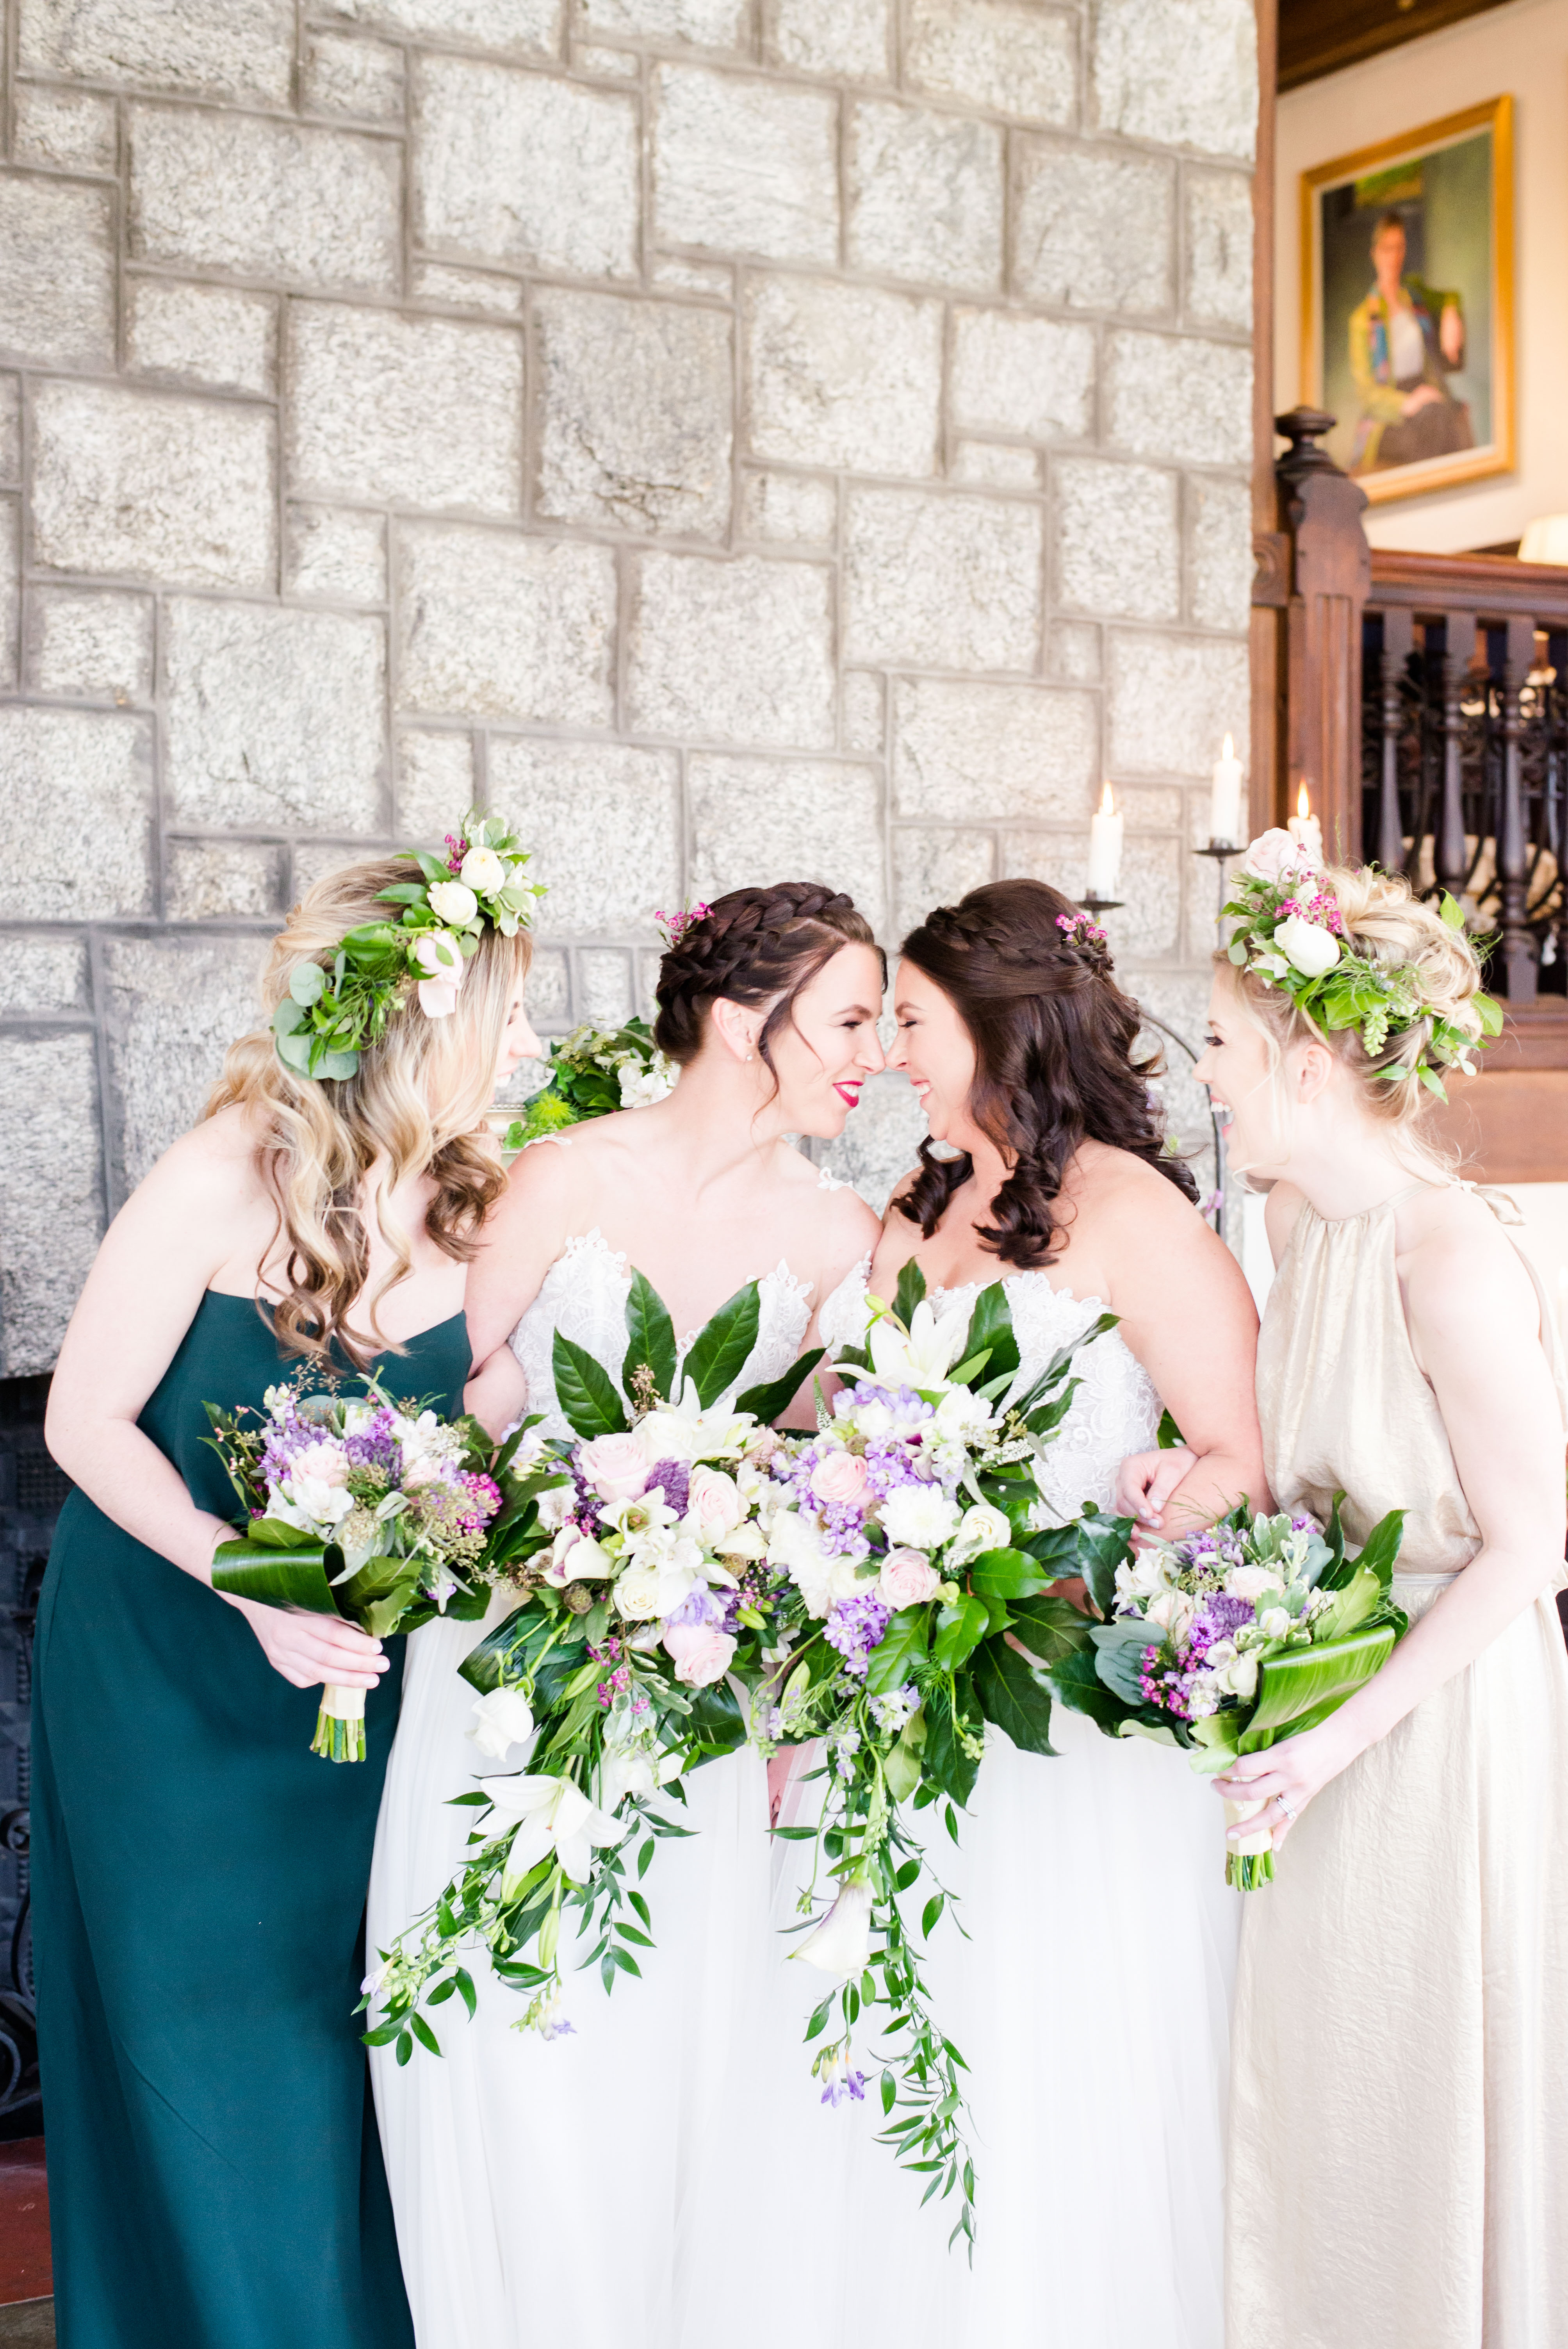 Baldwin-School-Wedding-Photographer-Event-Venue-Pennsylvania-Mainline-Andrea-Krout-Photography-9